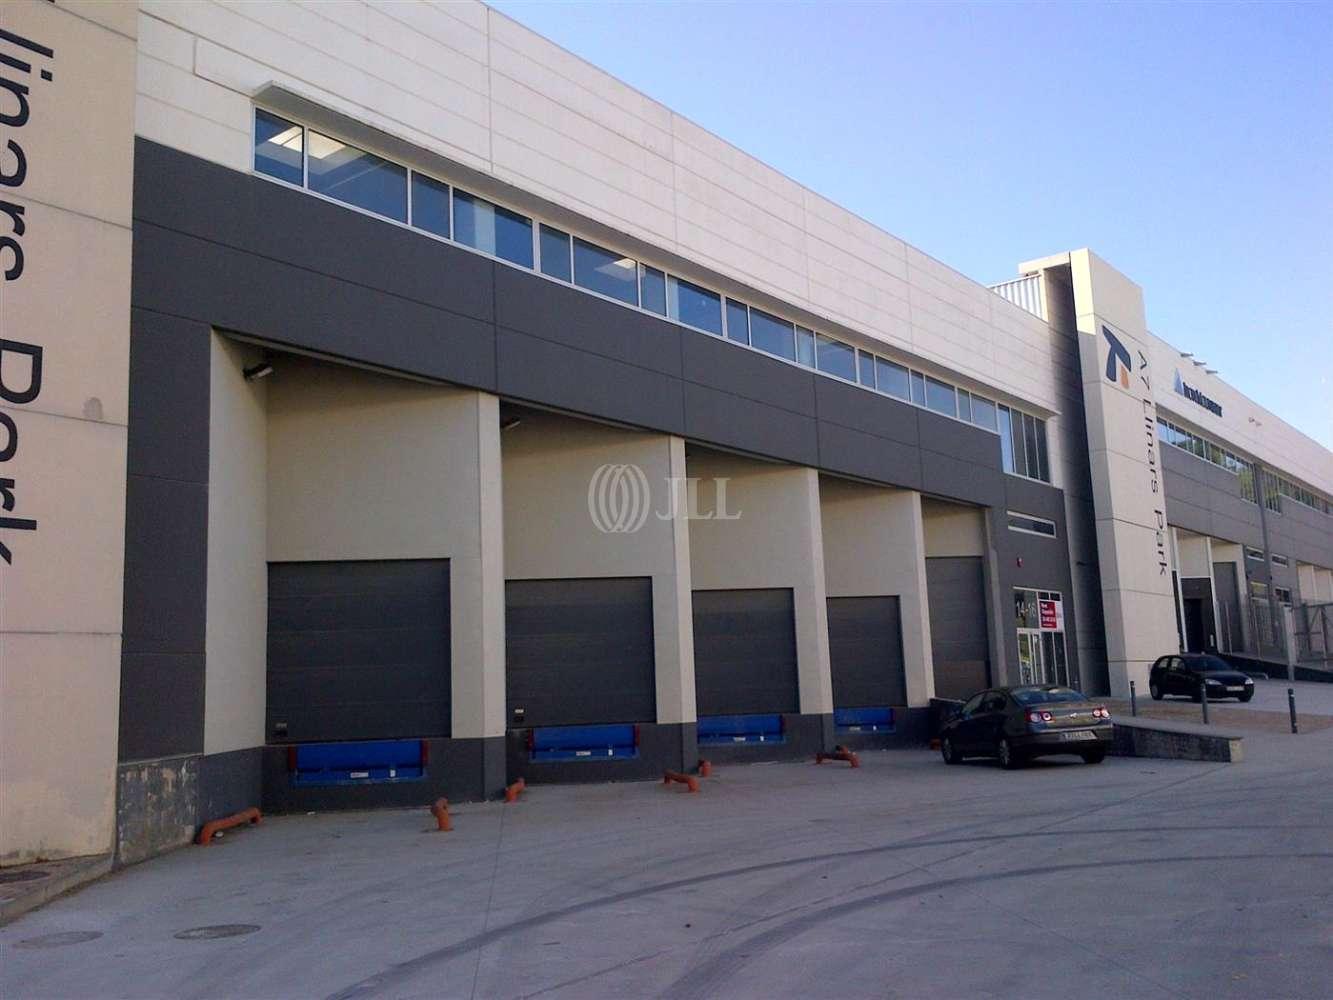 Naves industriales y logísticas Llinars del vallès, 08450 - Nave Logistica - B0105 - PI LLINARS PARK